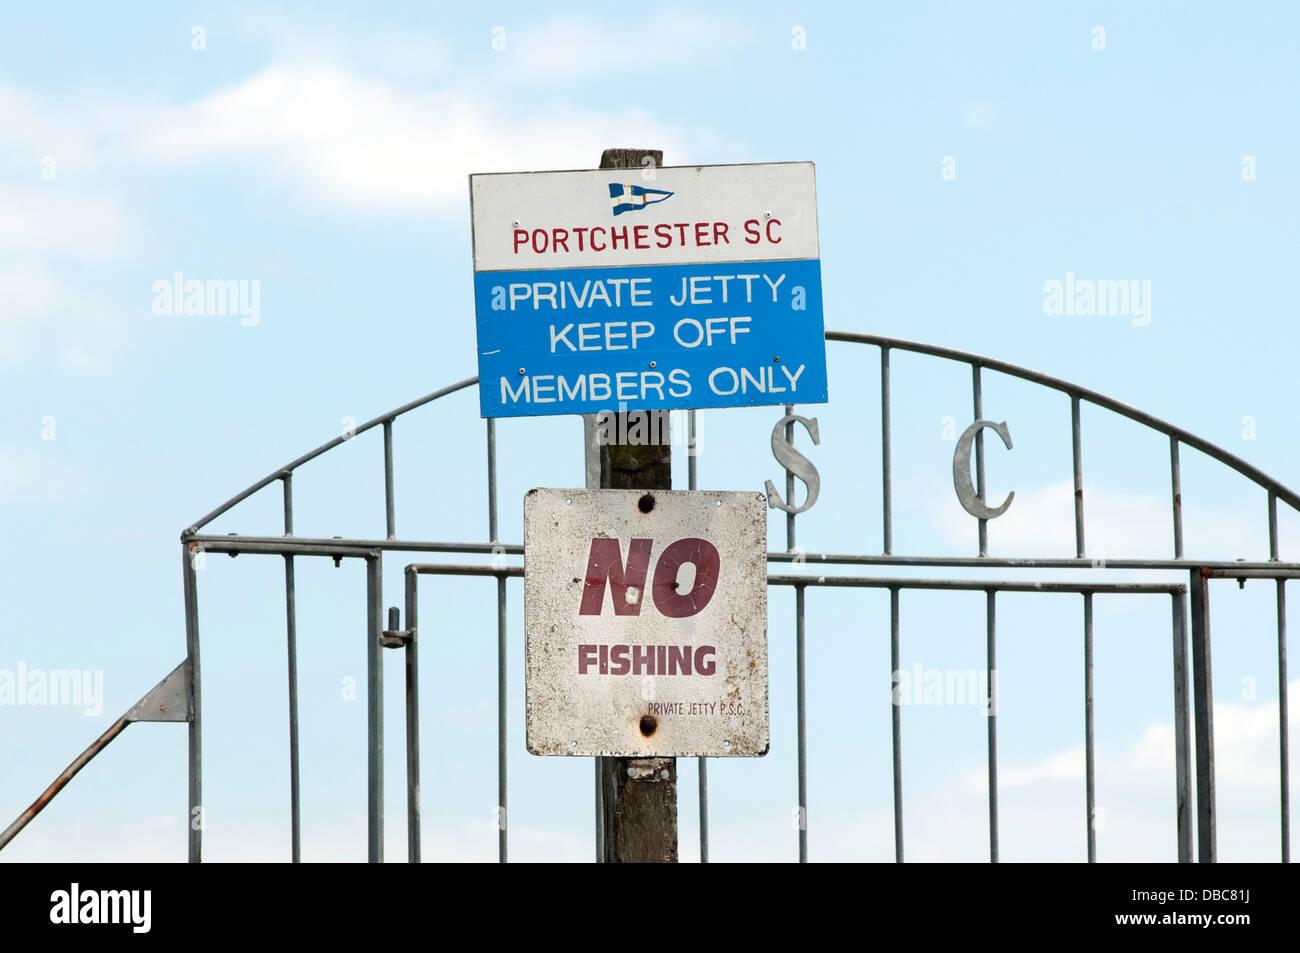 No fishing sign at Portchester sailing club - Stock Image